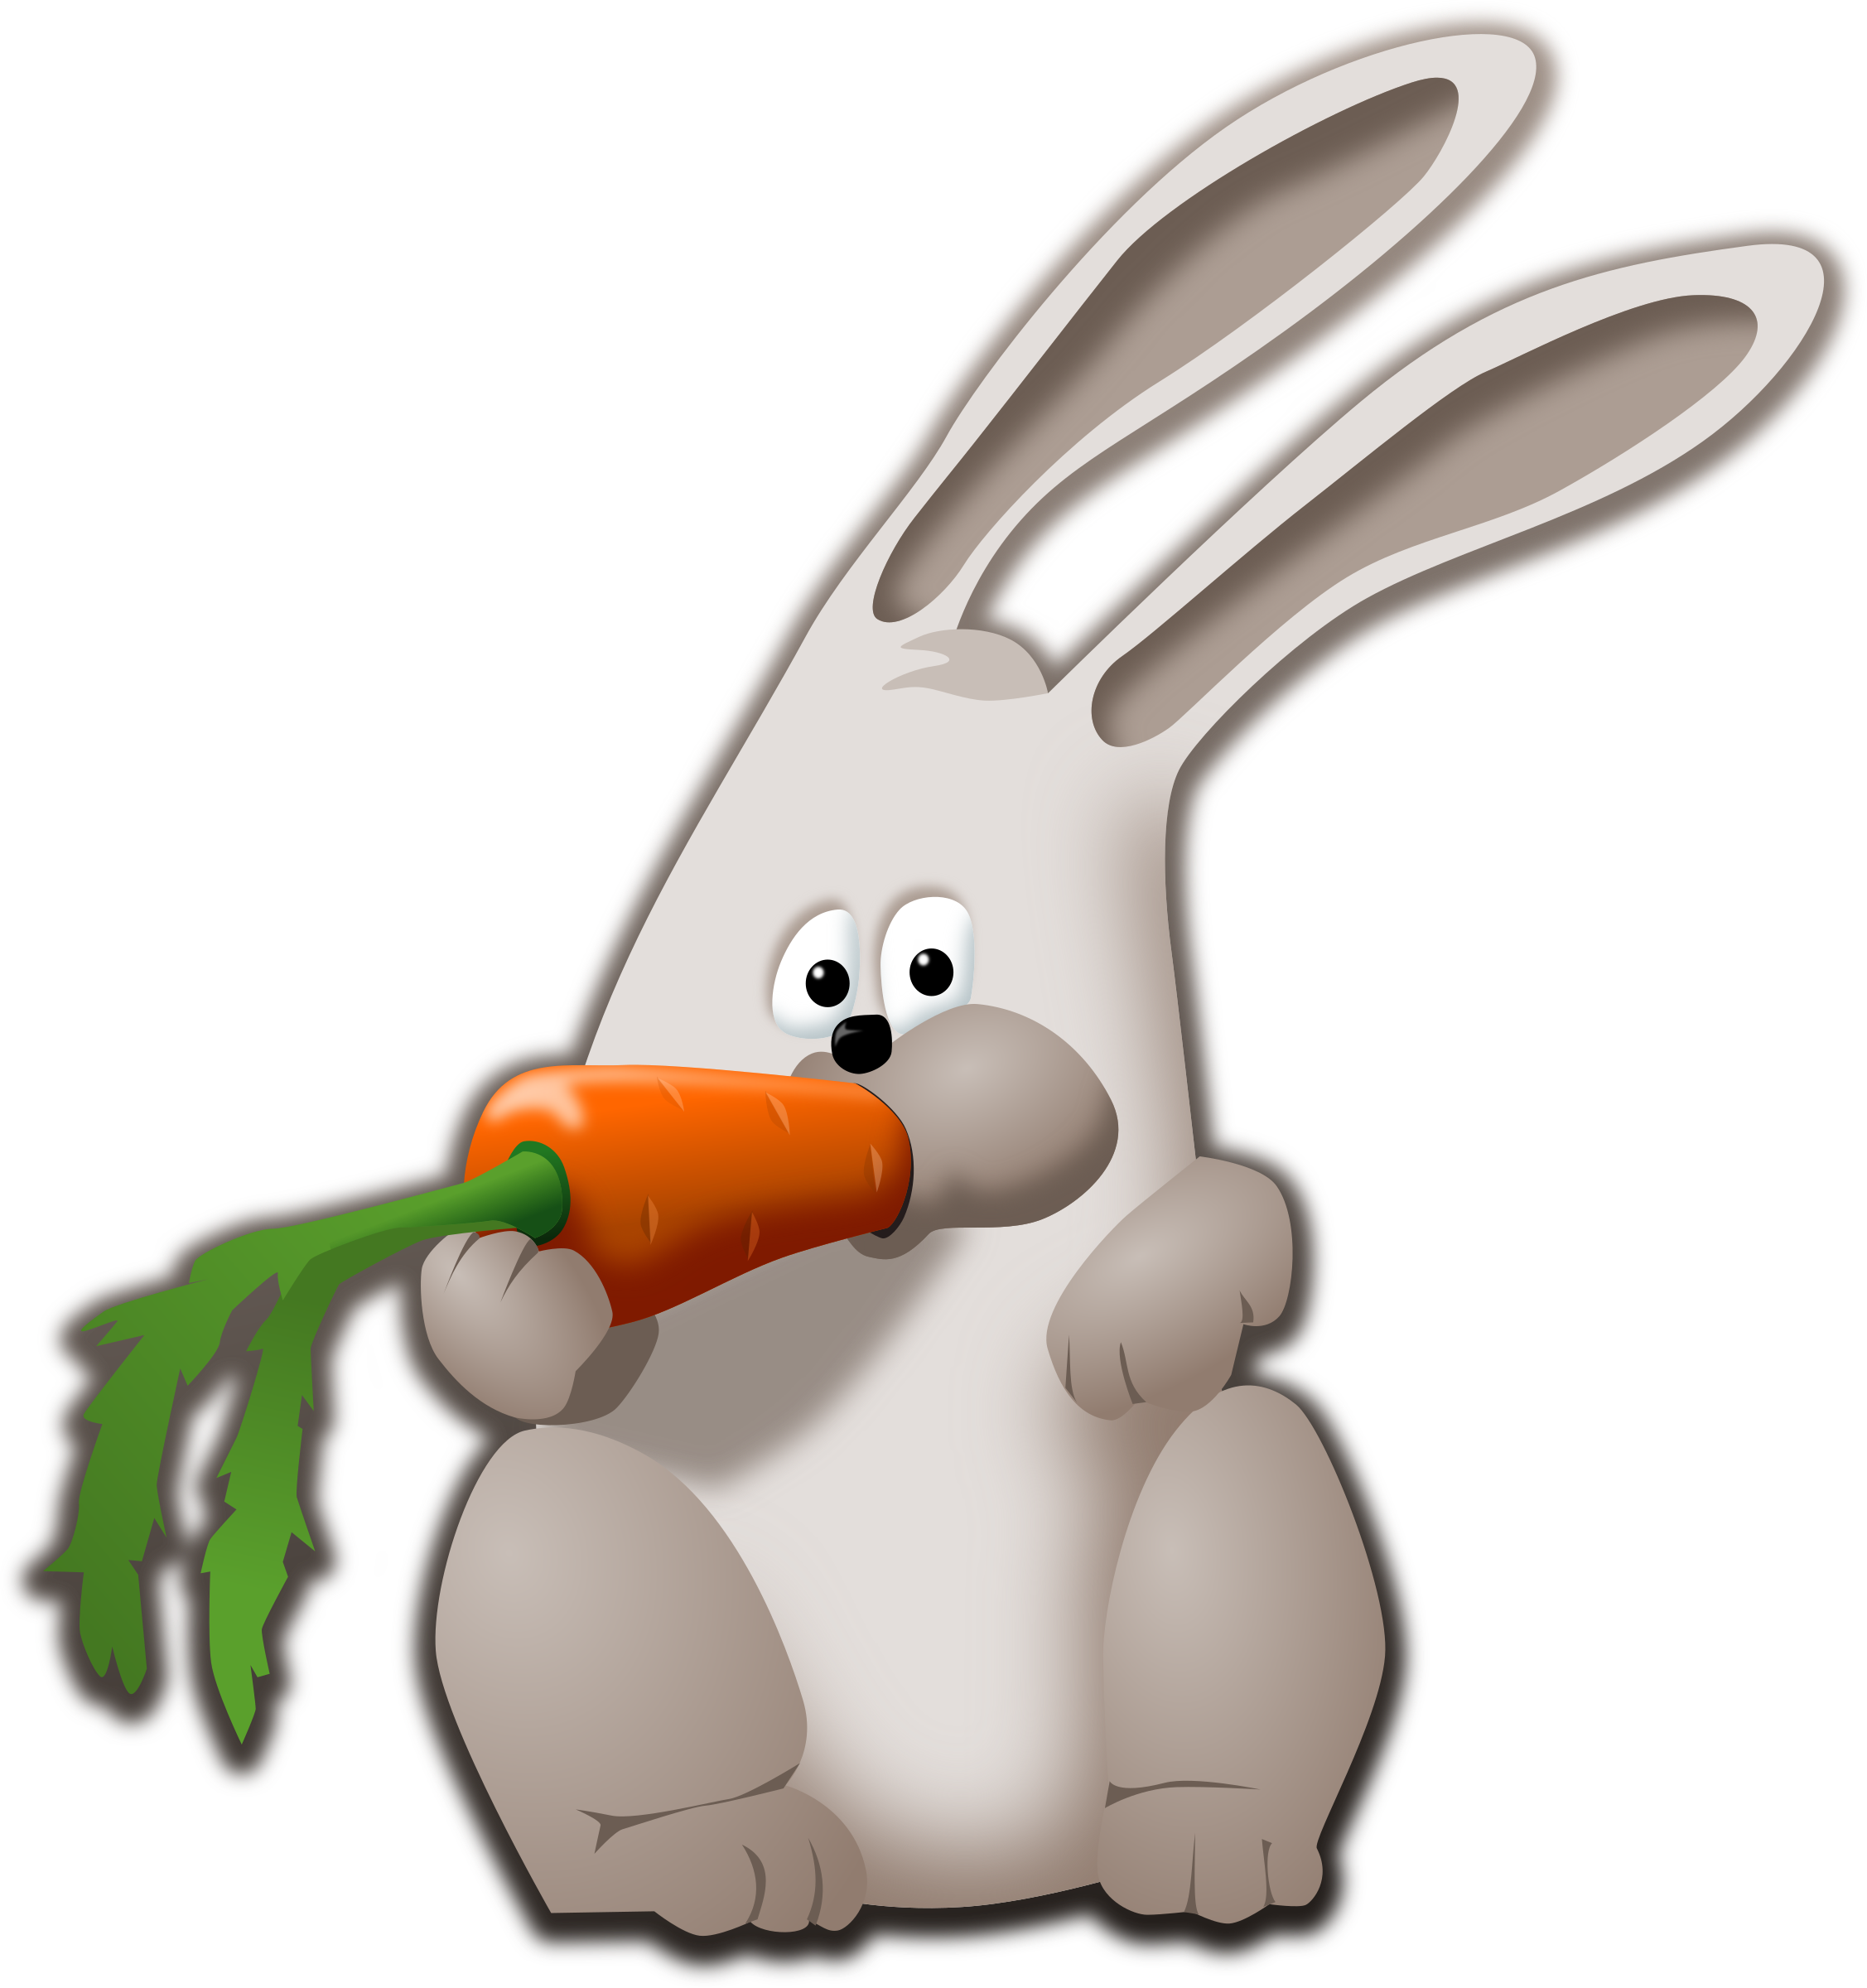 Carrot clipart big Carrot carrot eating Clipart bunny